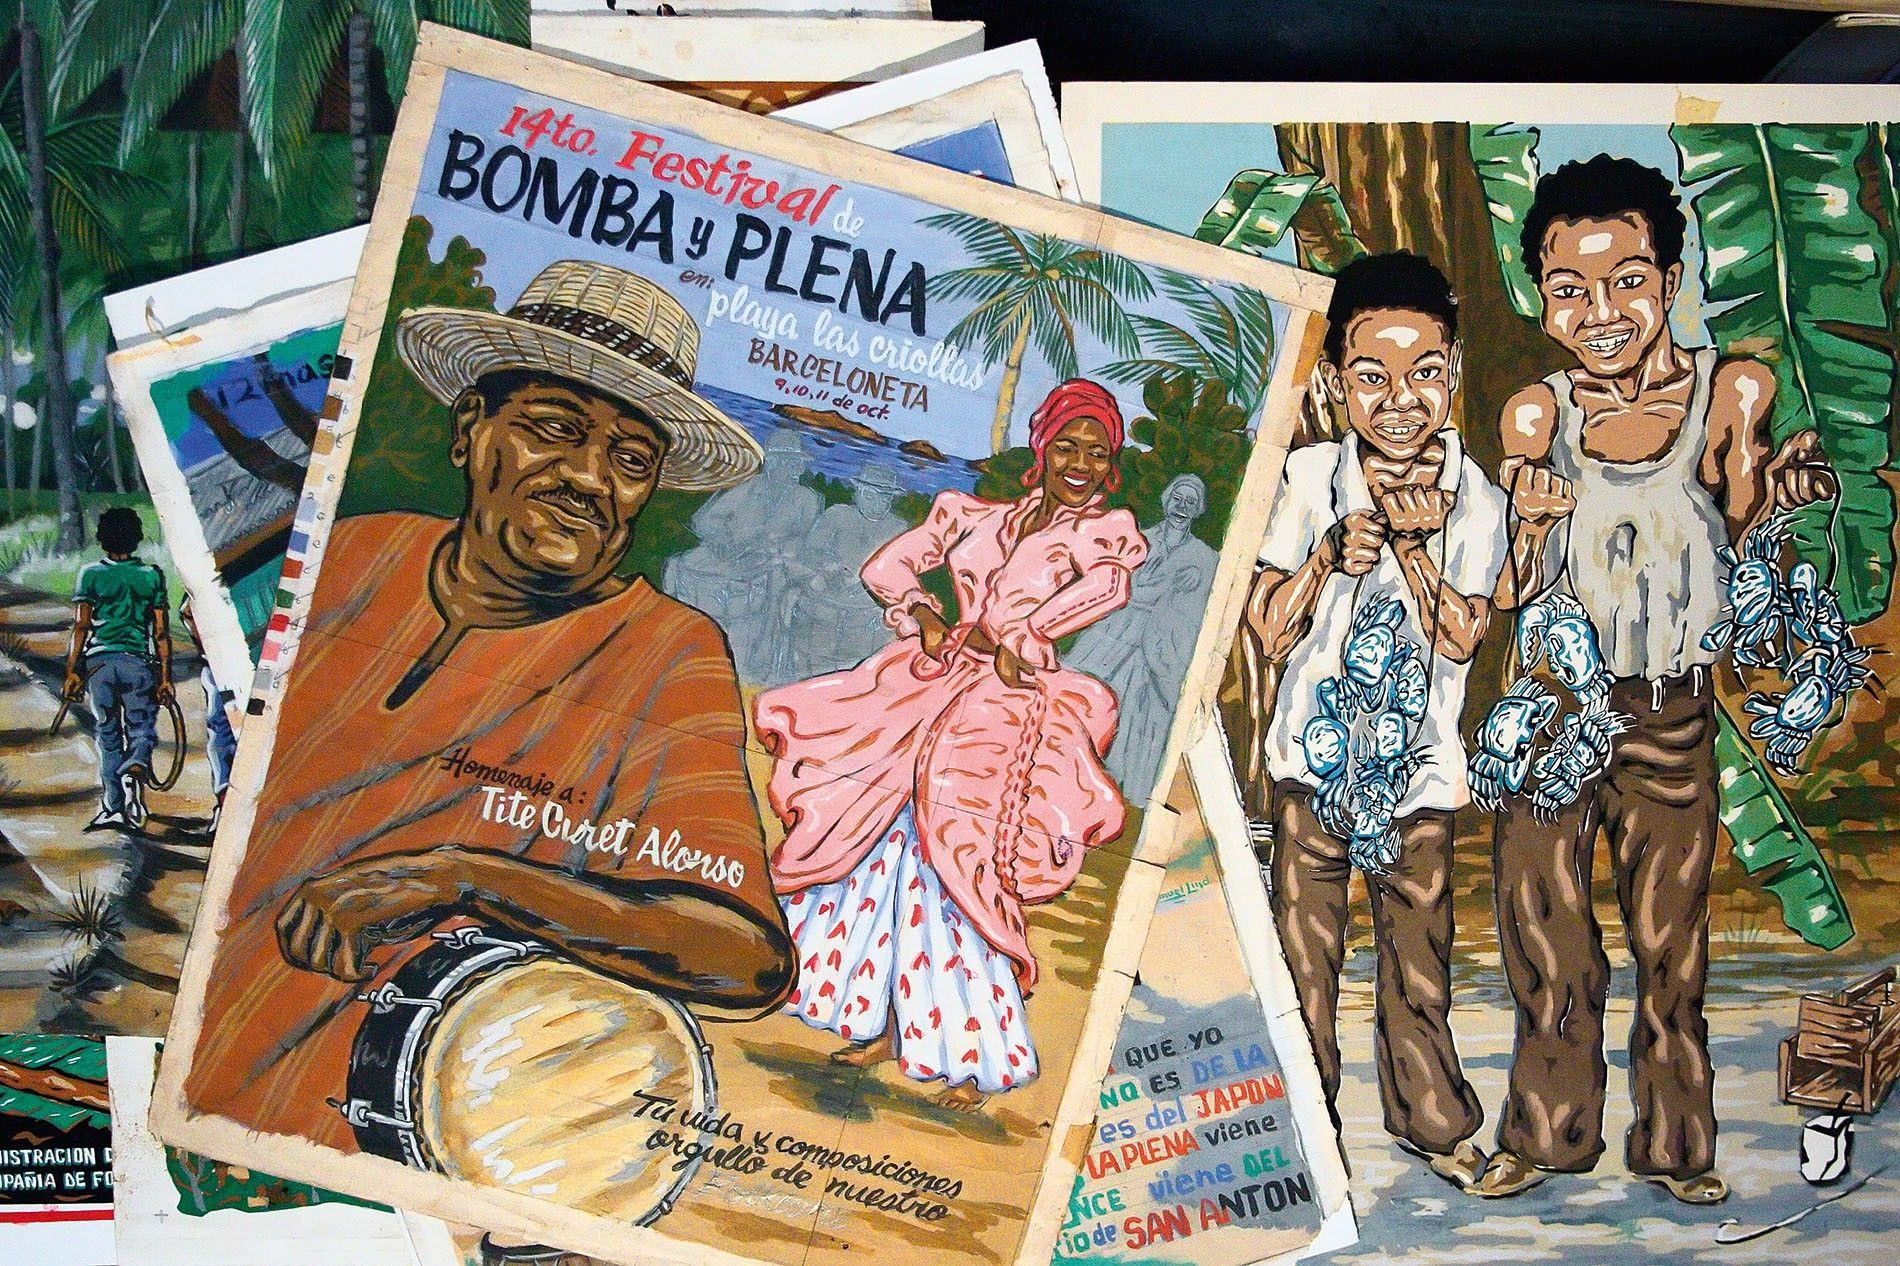 Bomba y plena posters, Loíza